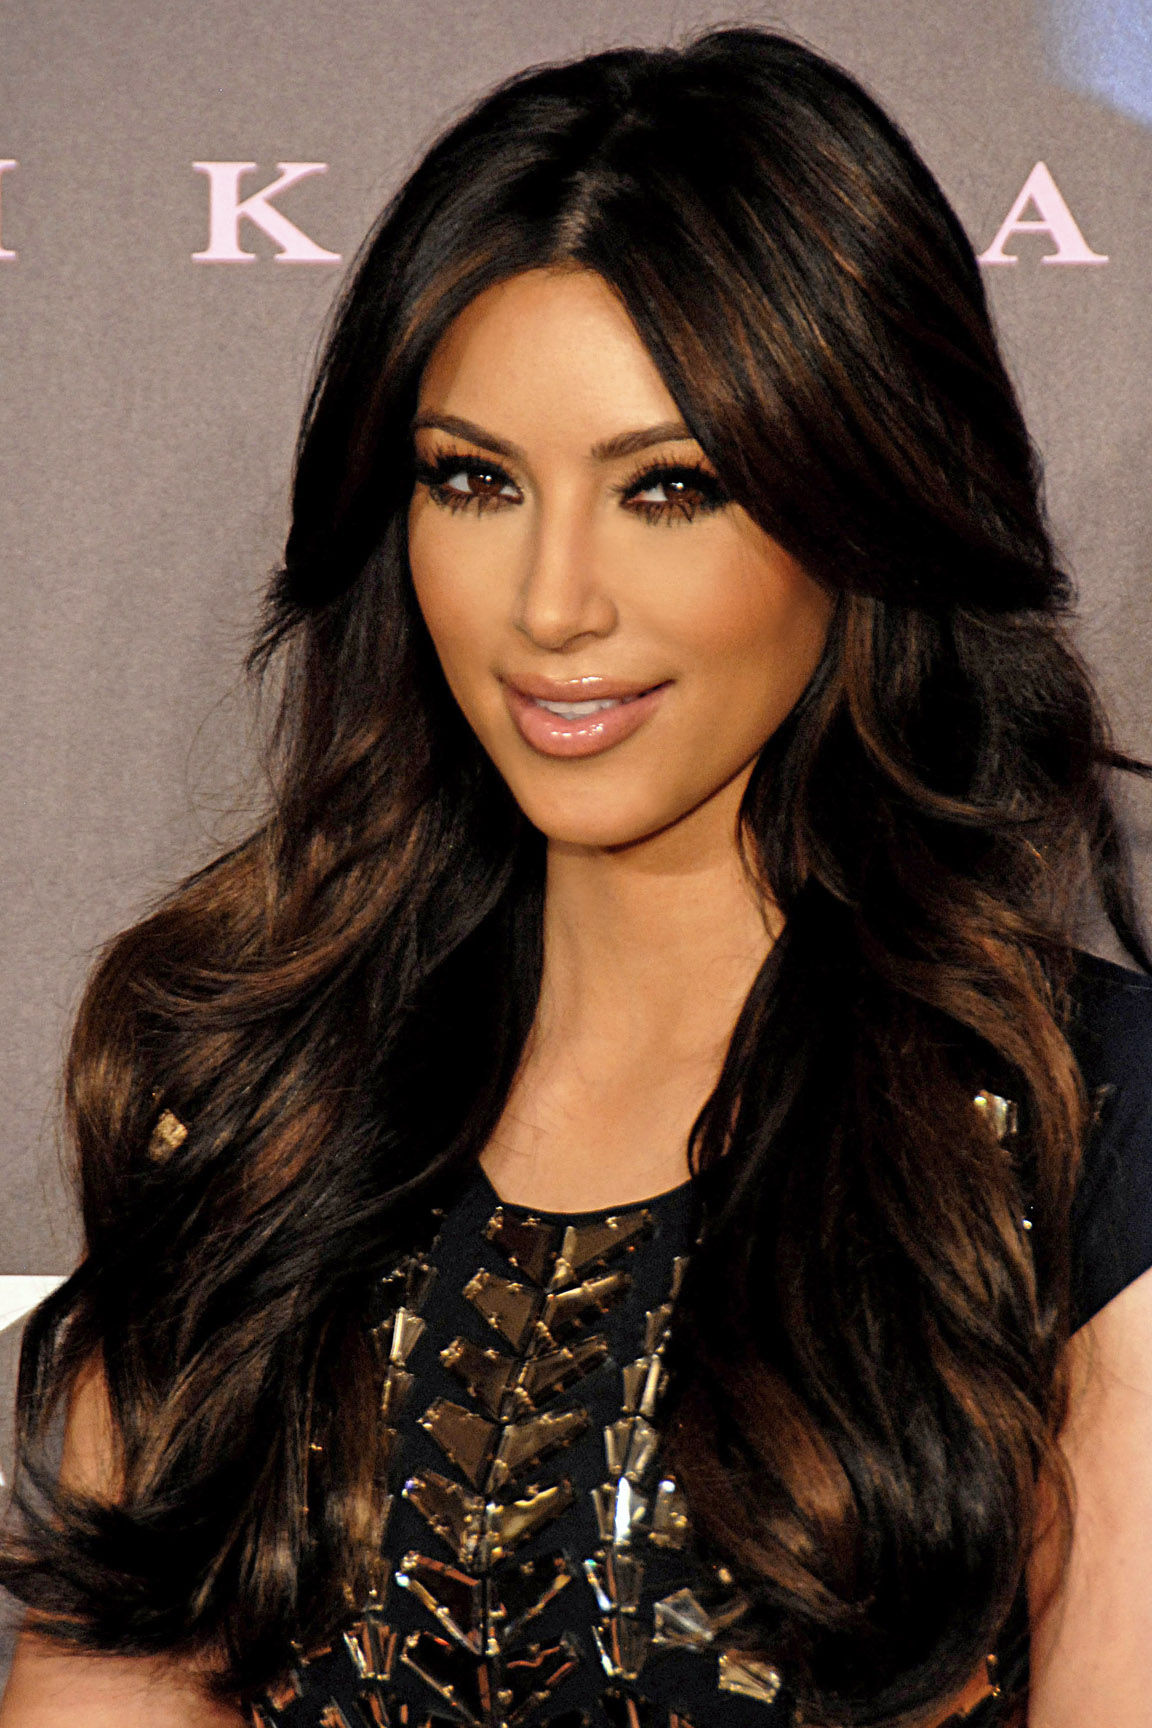 Photo of Kim Kardashian: American television personality